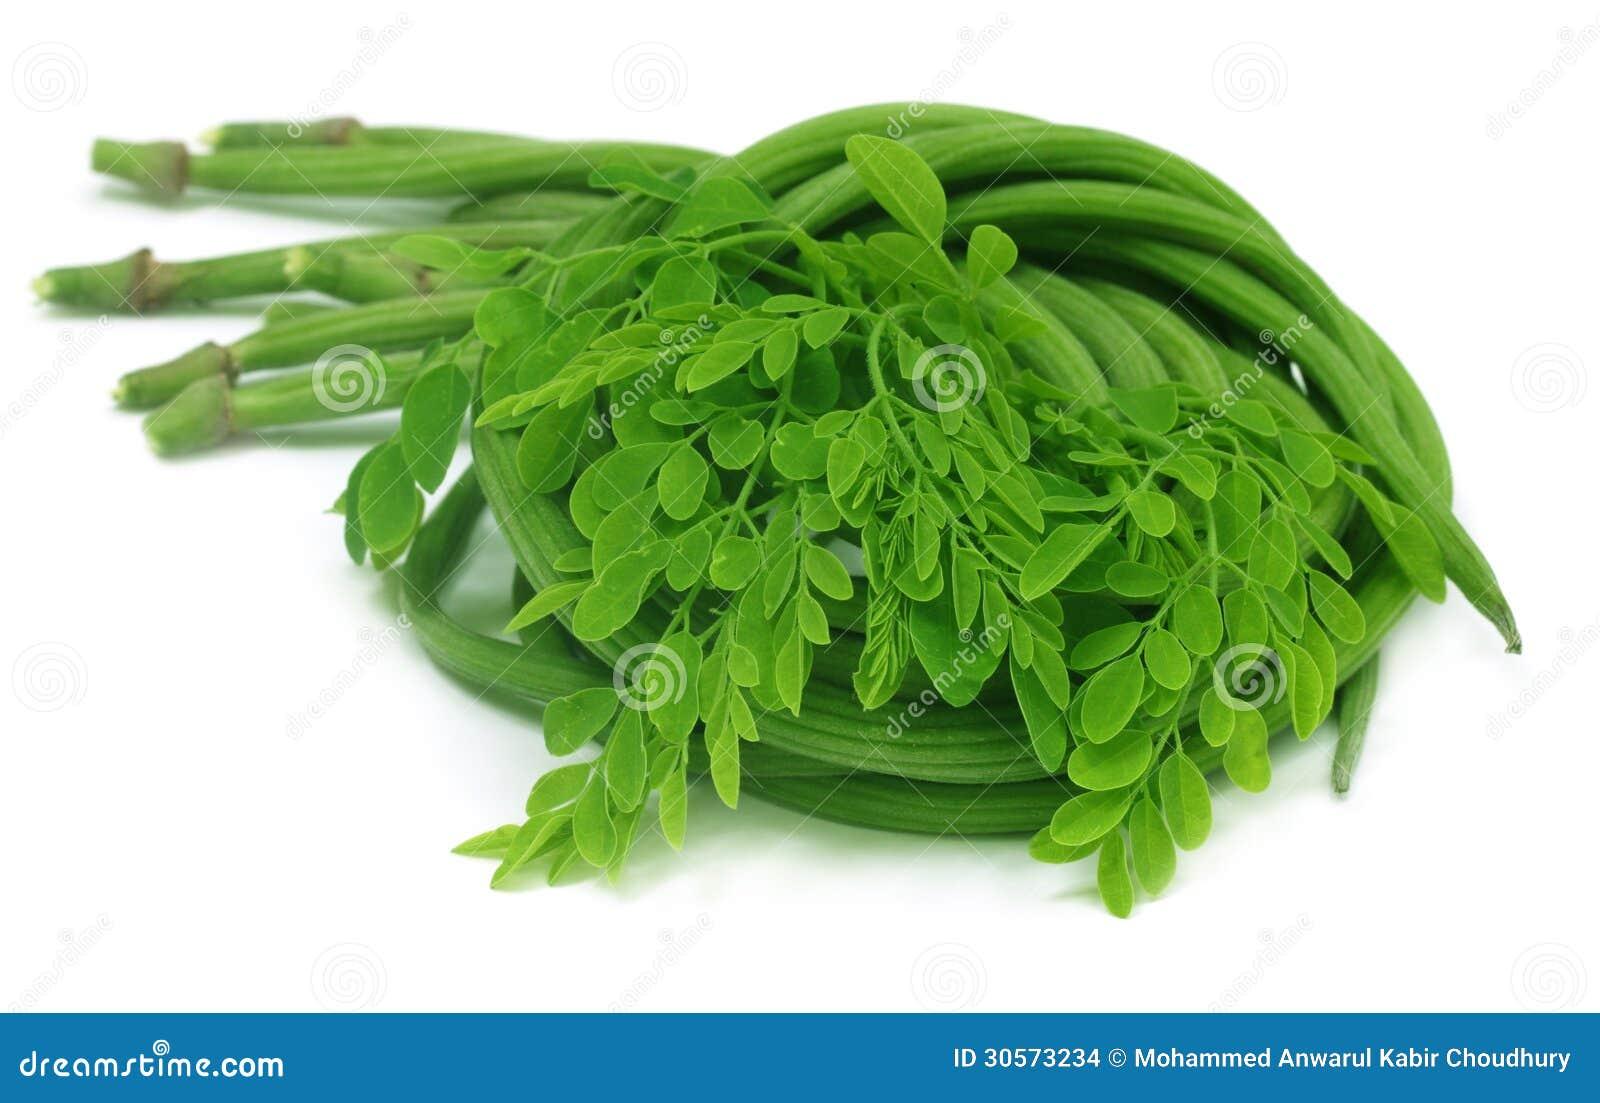 Moringa Oleifera или sonjna с свежими листьями